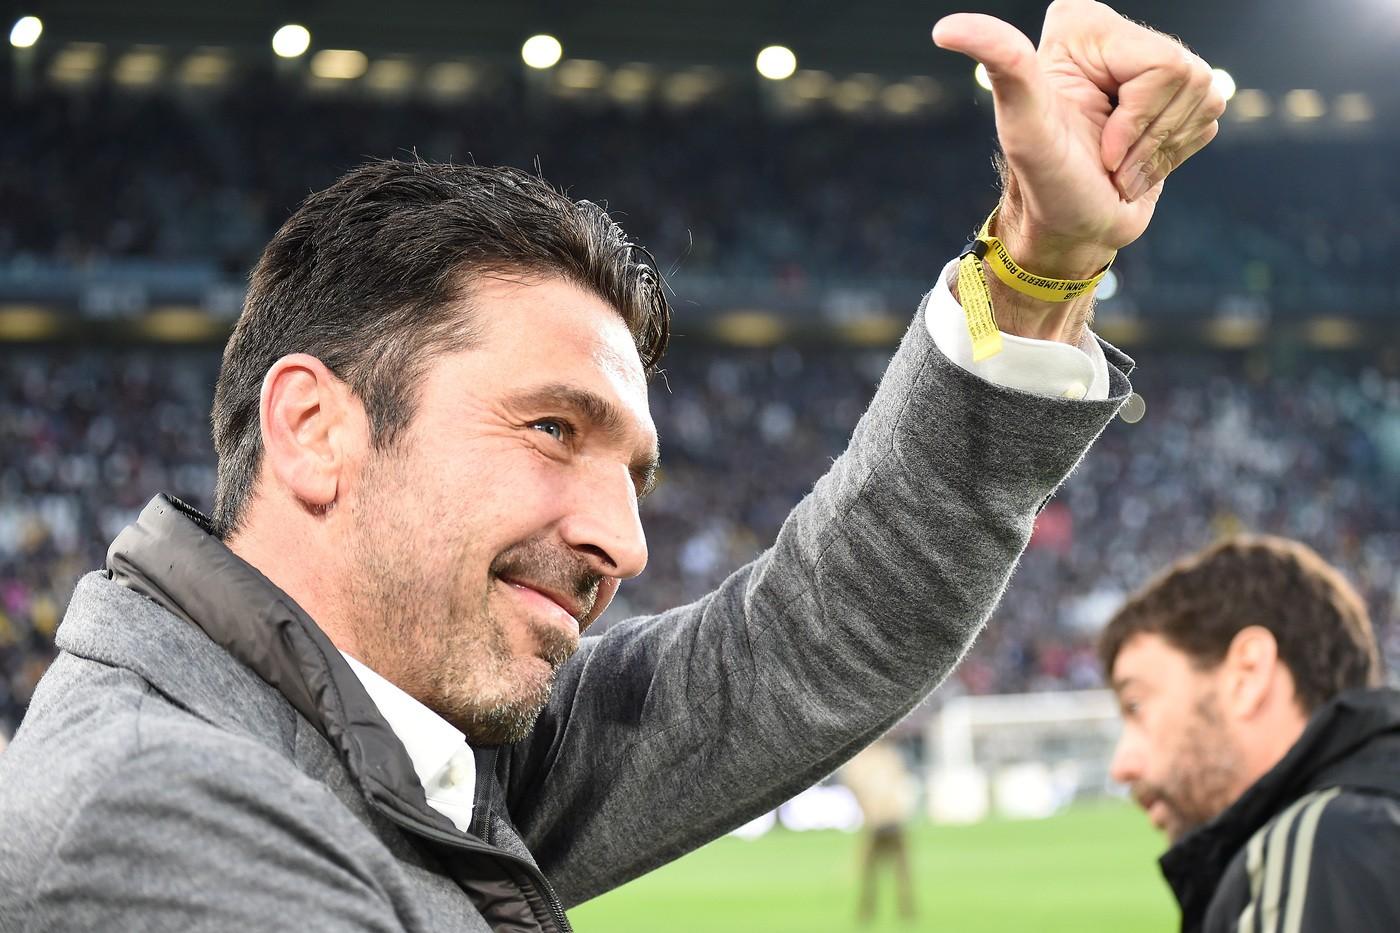 Buffon (Foto LaPresse - Tano)